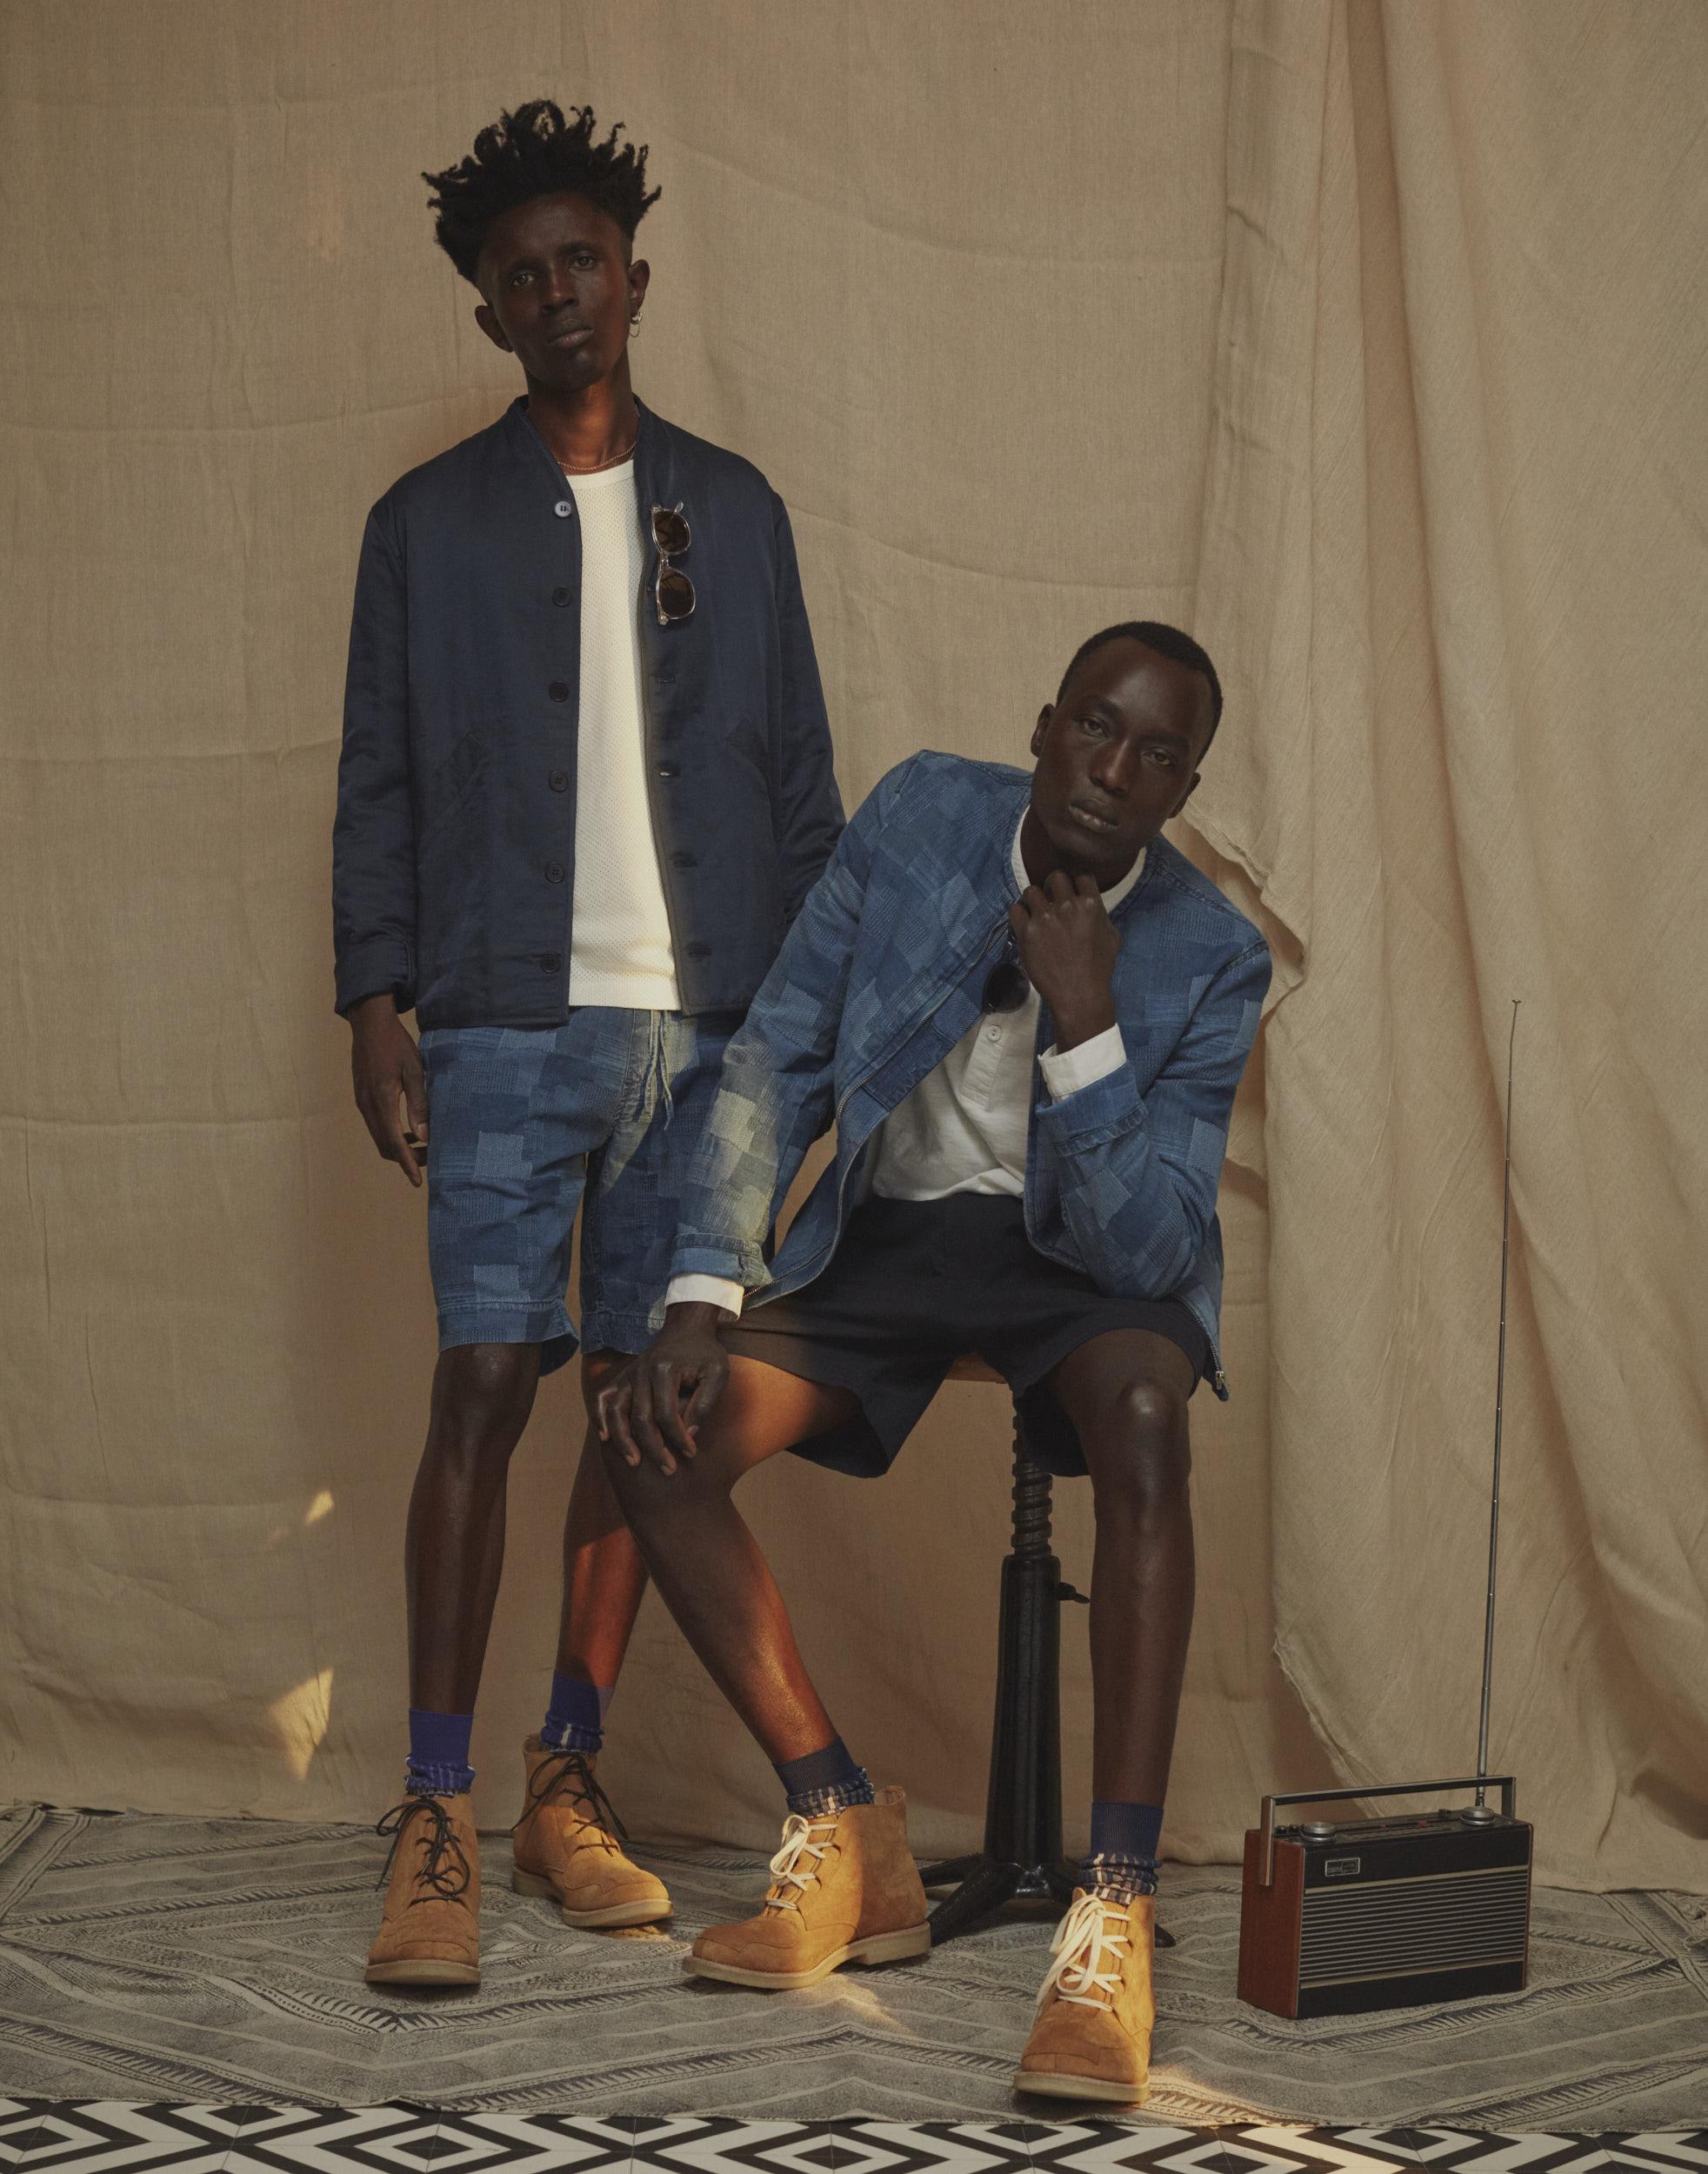 ymc-ss17-collection-okoro-men-fashion-folkr-2